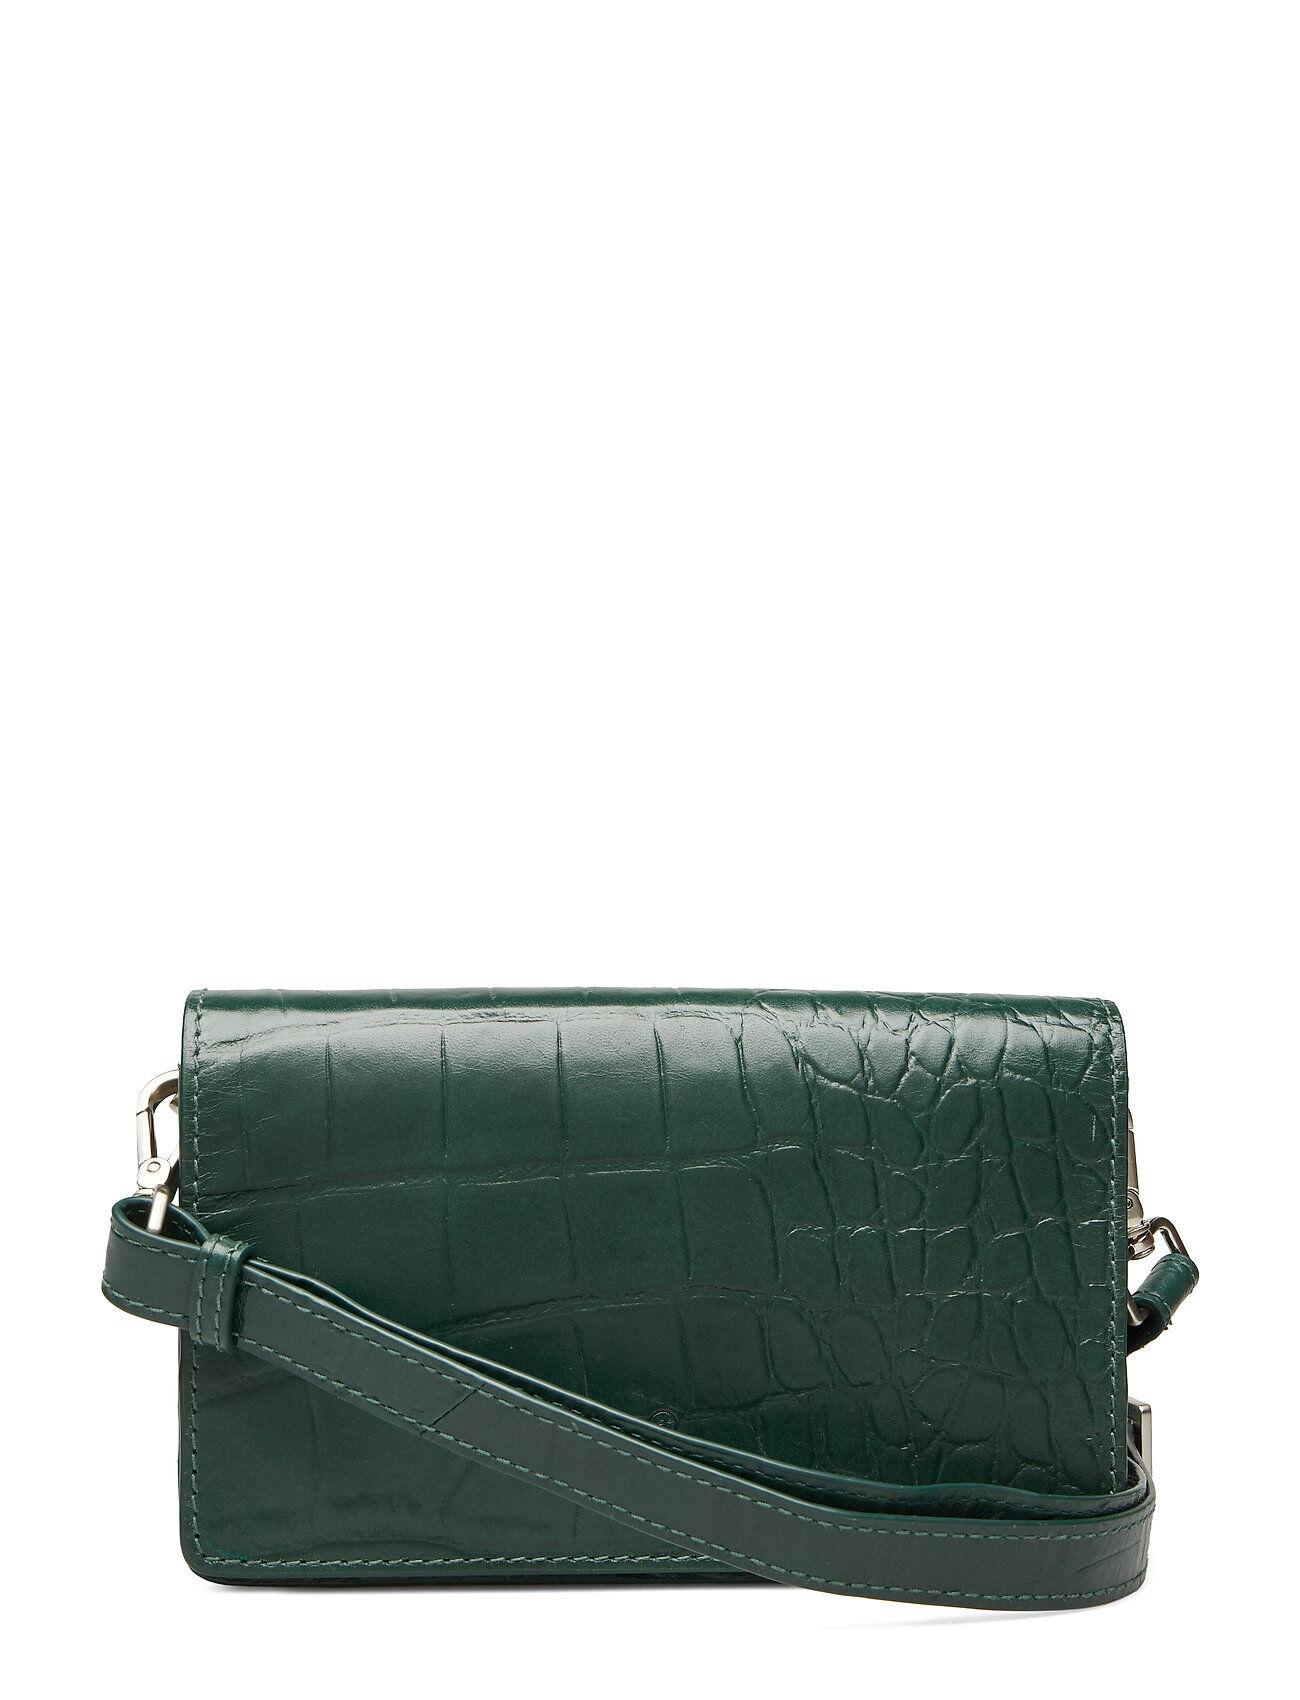 Adax Teramo Shoulder Bag Lykke Bags Small Shoulder Bags - Crossbody Bags Vihreä Adax